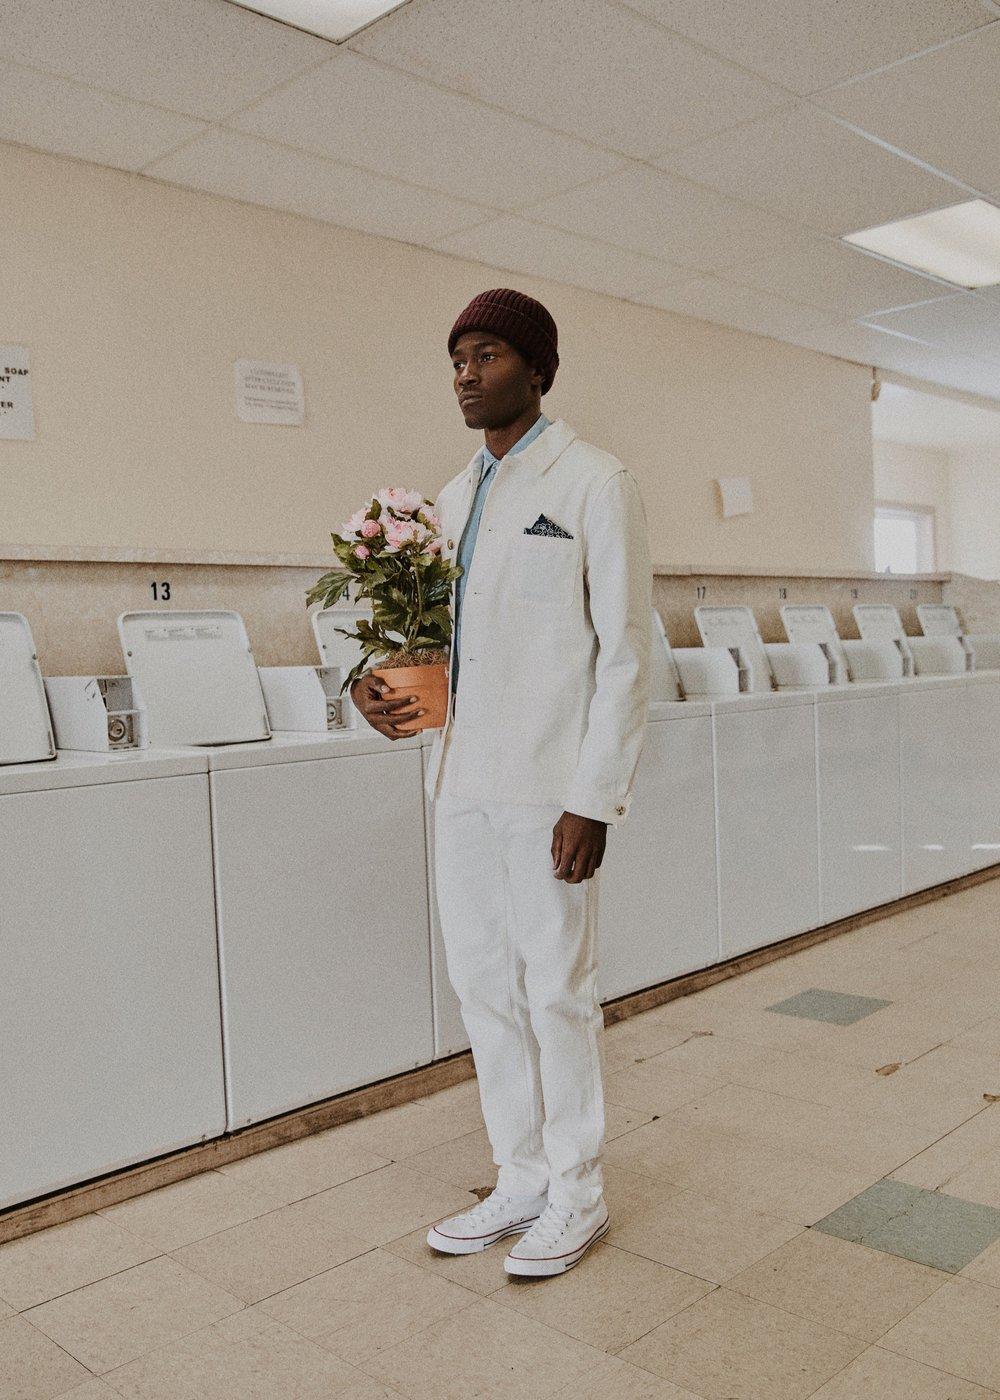 10_01_Laundromat-Arturo-Suzy-035_w.JPEG